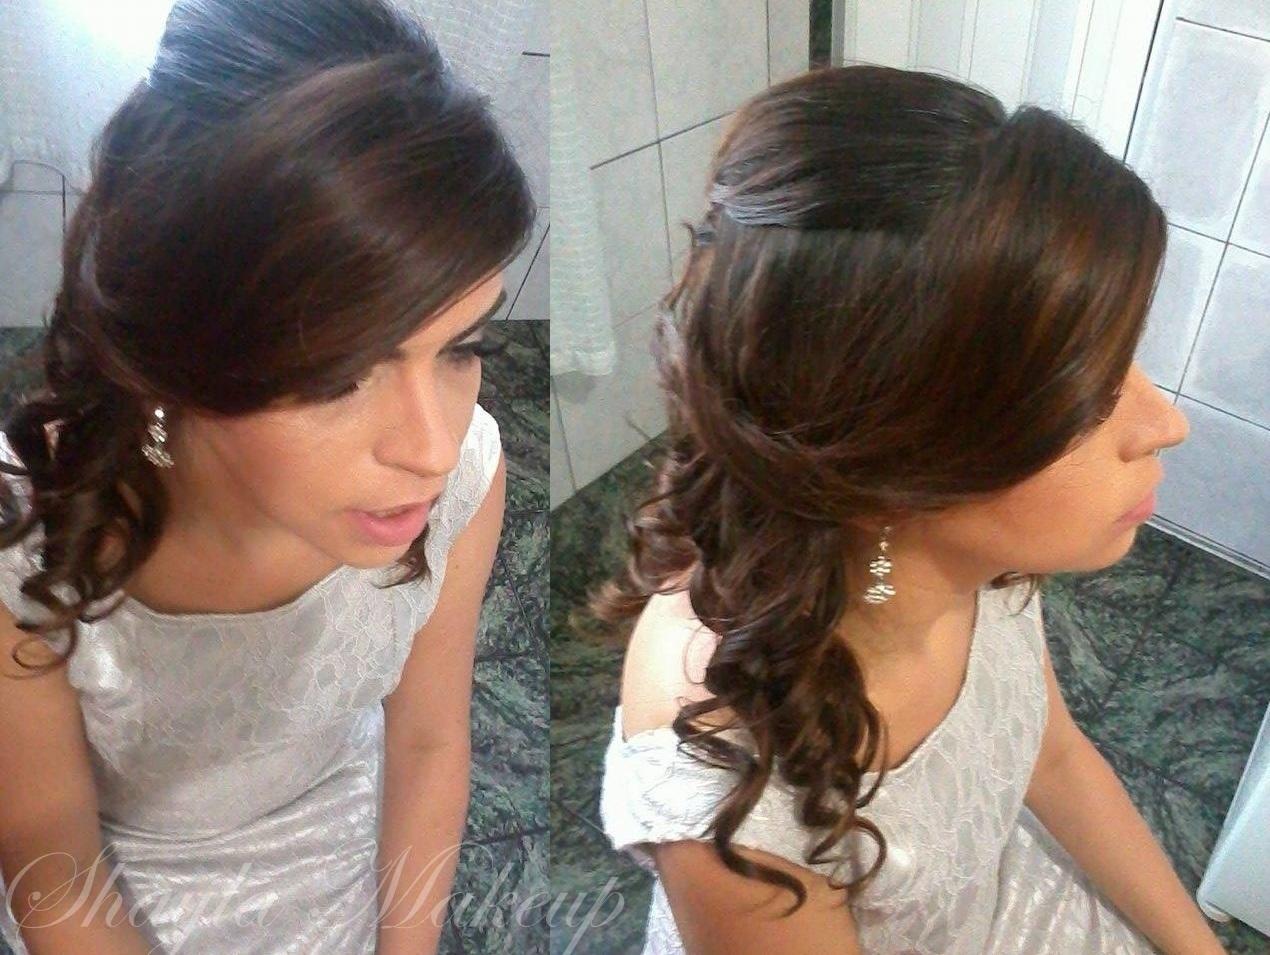 #Penteado https://www.facebook.com/pages/Shayla-MakeUp/426126237544233?fref=ts maquiador(a)